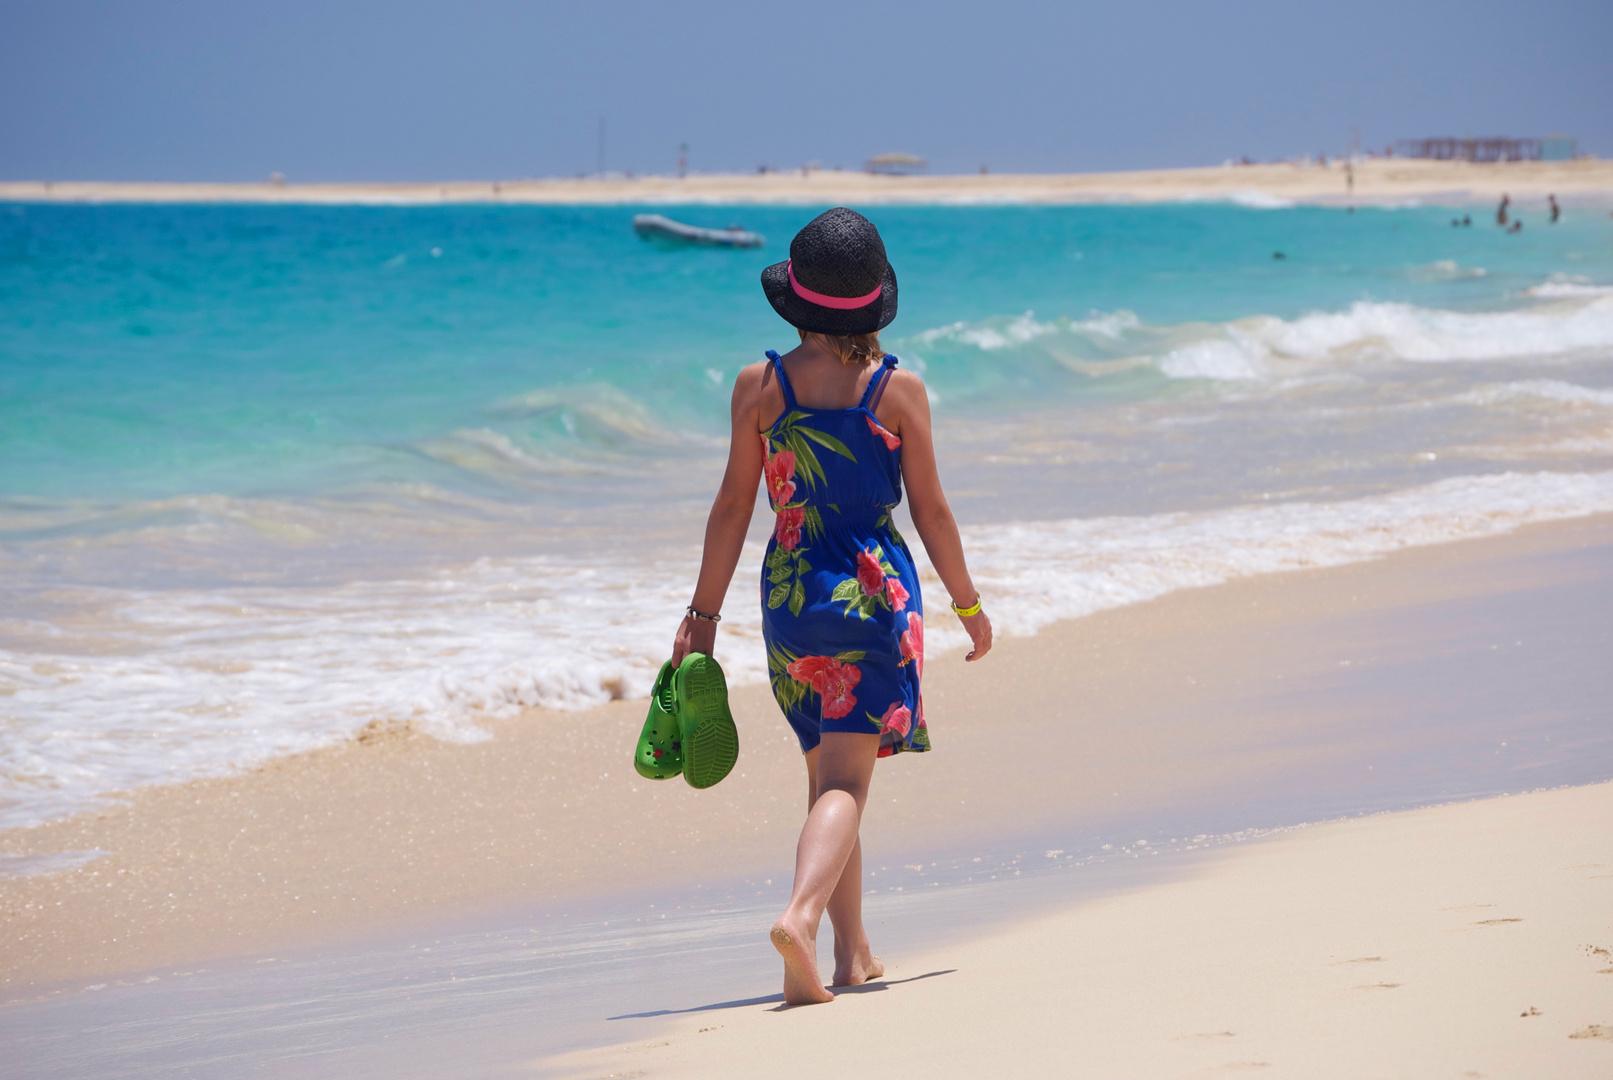 Spaziergang am Strand. Cabo Verde, 2011